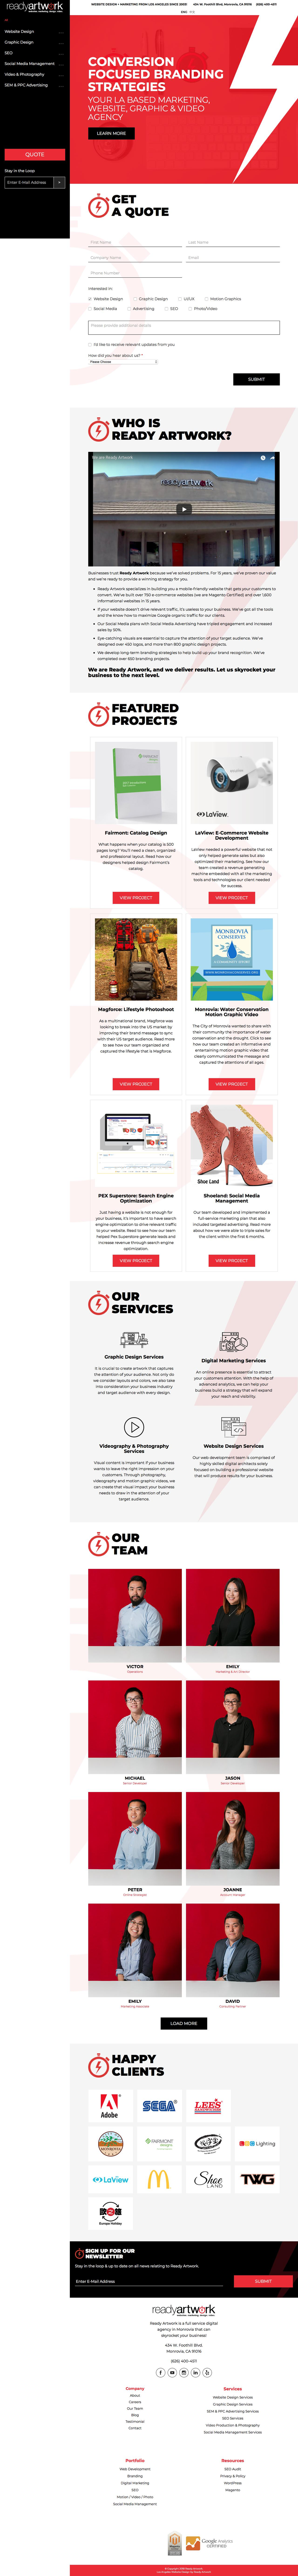 Screenshot of readyartwork.com - Website Design, SEO, Motion Video & Graphic Design CompanyReady Artwork | Website Design + Marketing from Los Angeles since 2003! - captured June 11, 2018